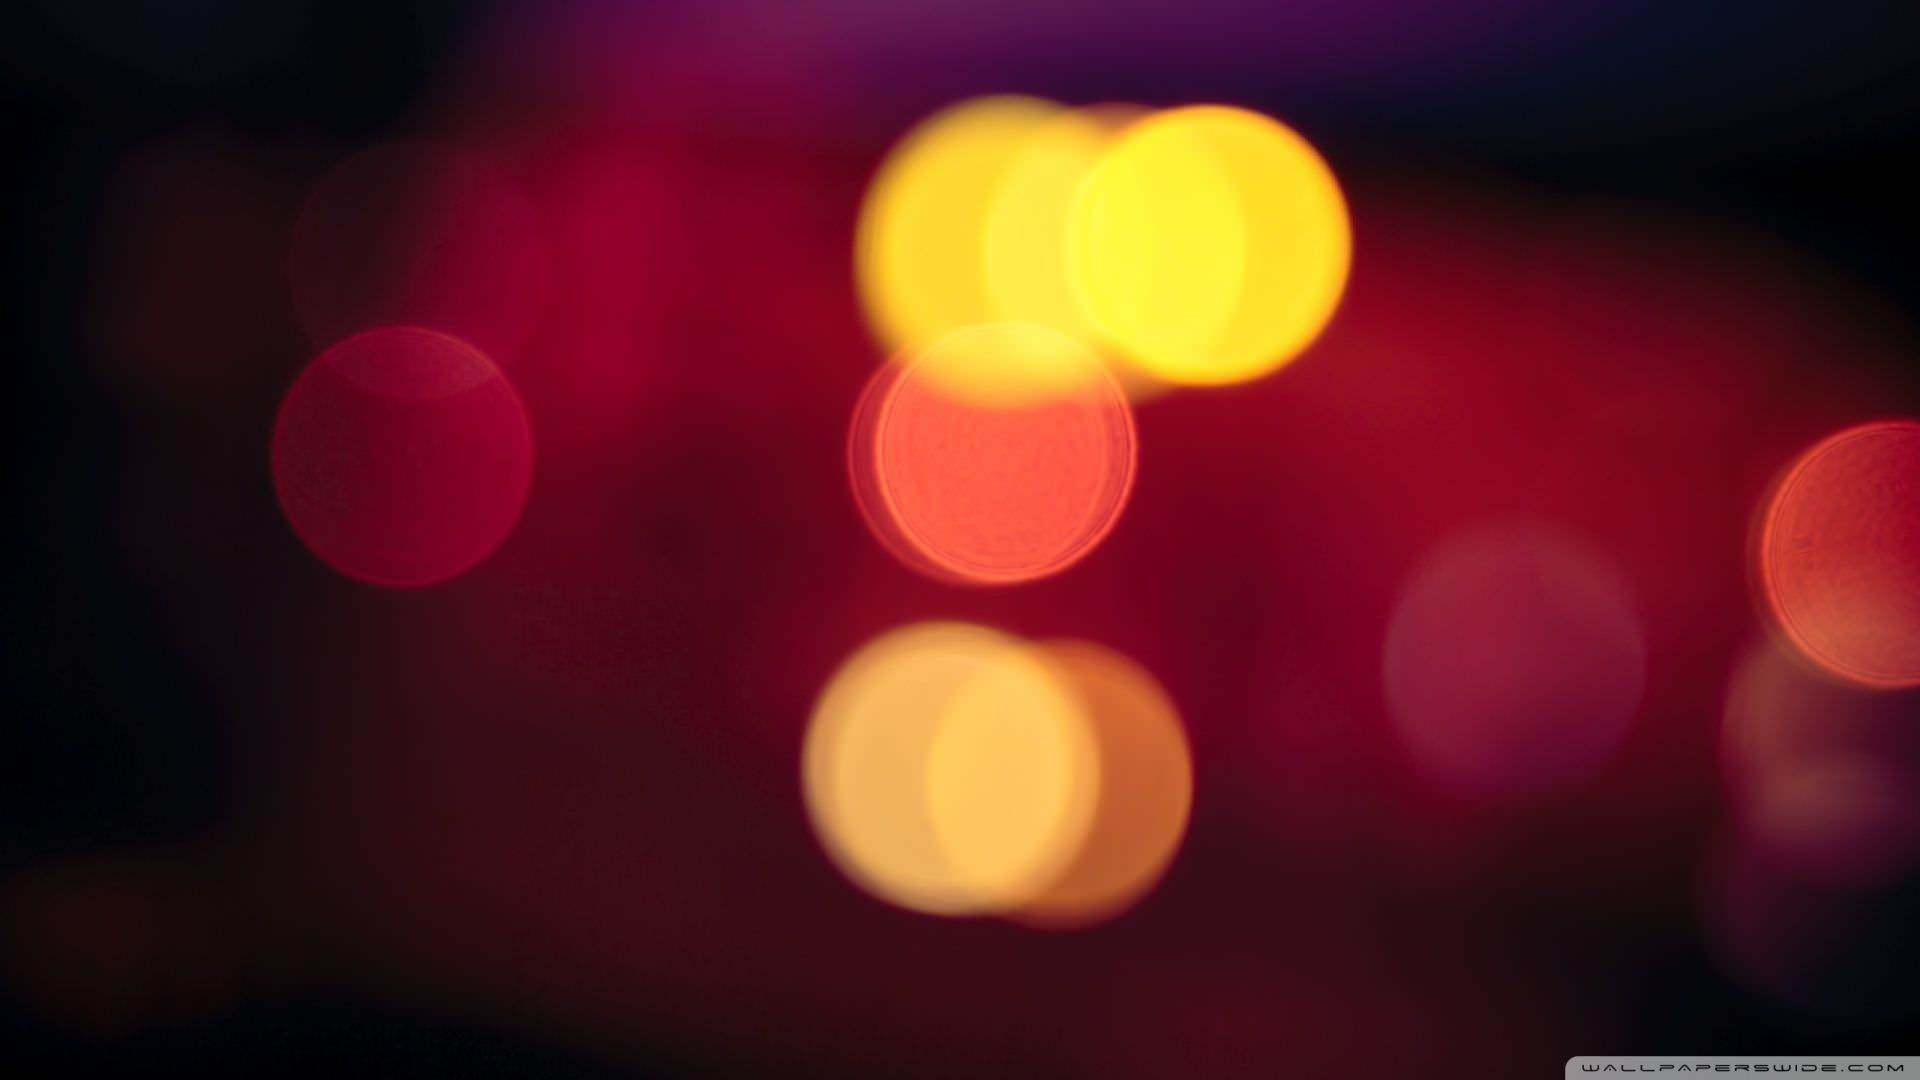 Blurred Bokeh Lights Wallpaper